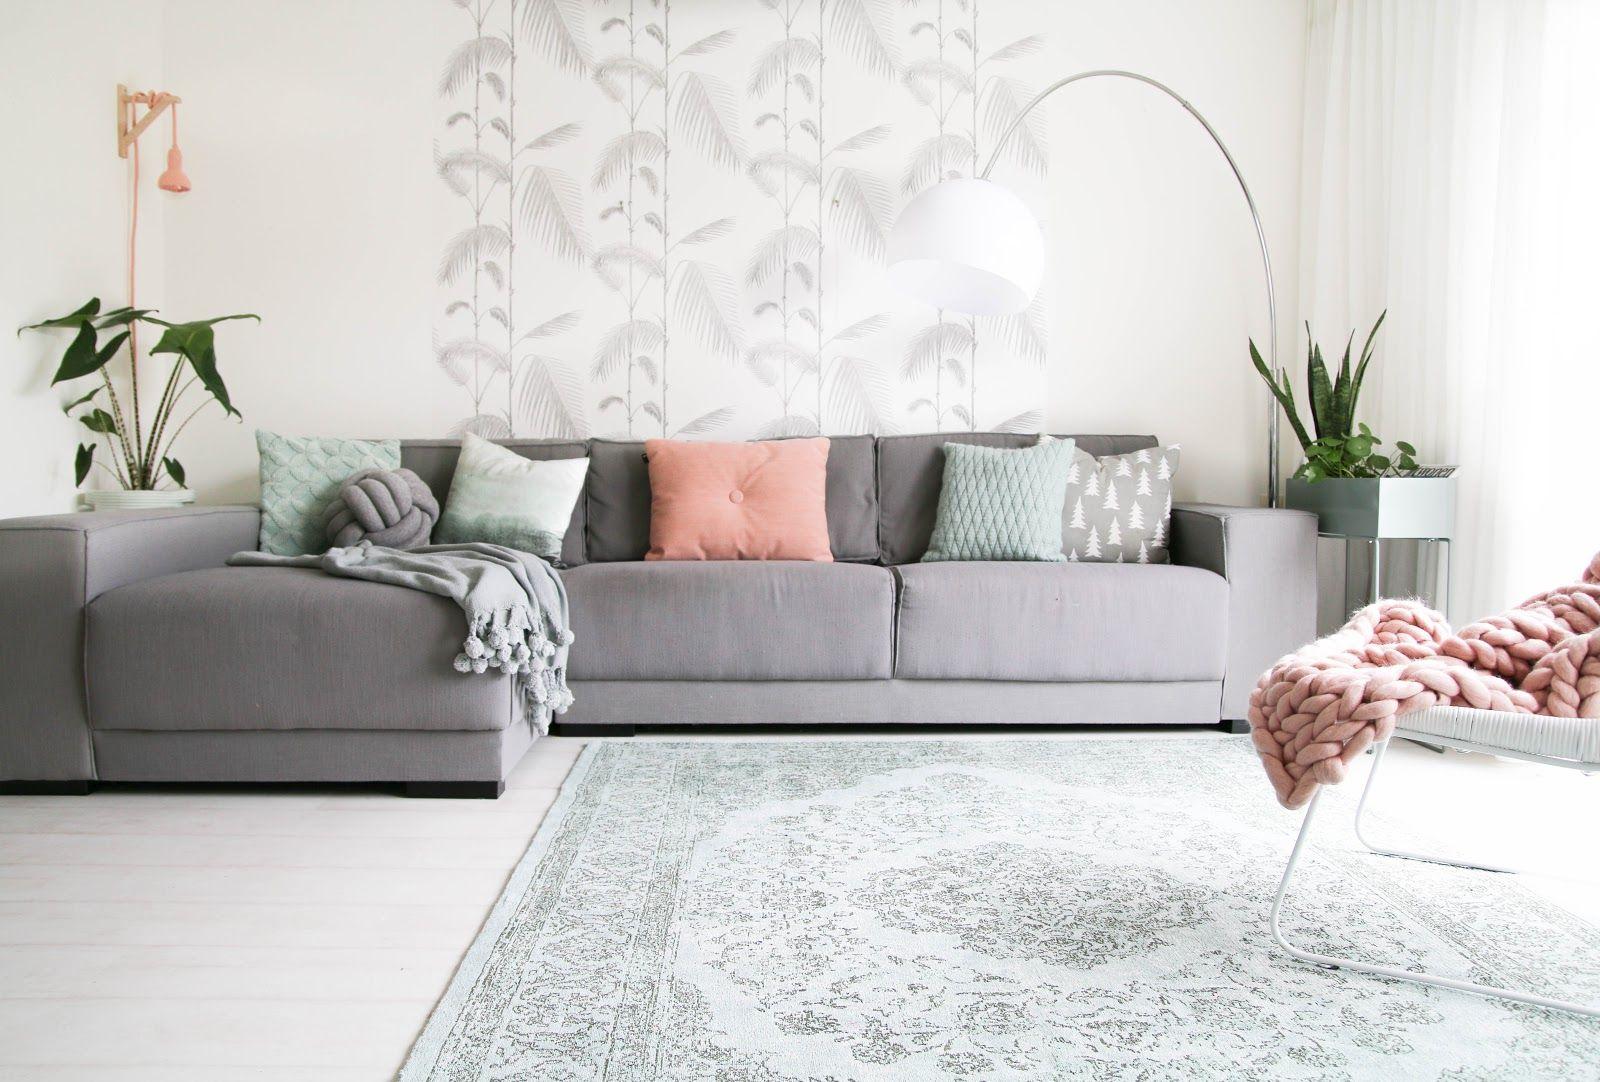 Scandinavisch Pastel Interieur : Over interieur en fotografie scandinavisch wonen future